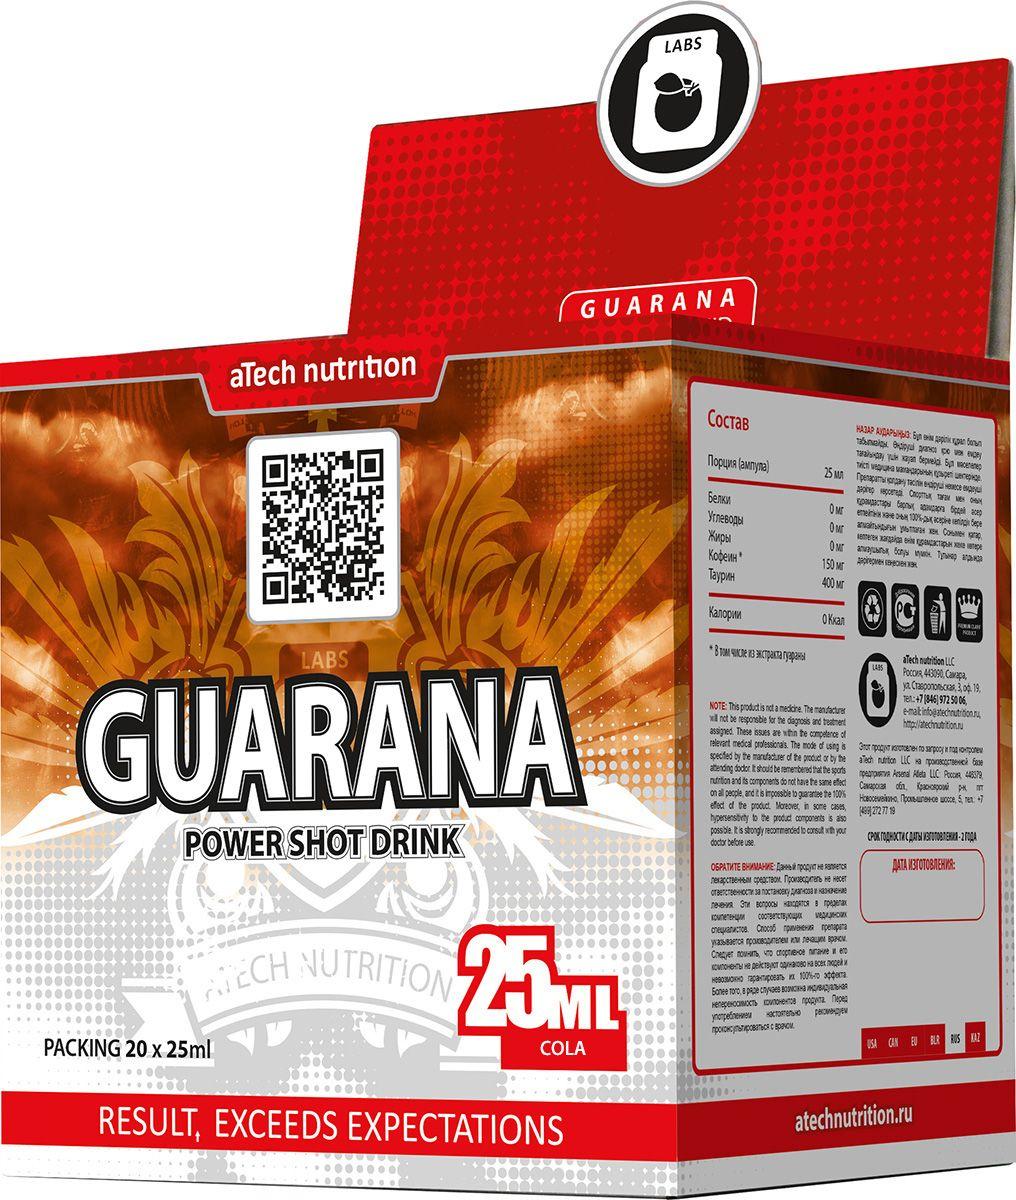 "Энергетический напиток aTech Nutrition ""Guarana Power Shot Drink"", кола, 25 мл, 20 шт 14630019671149"